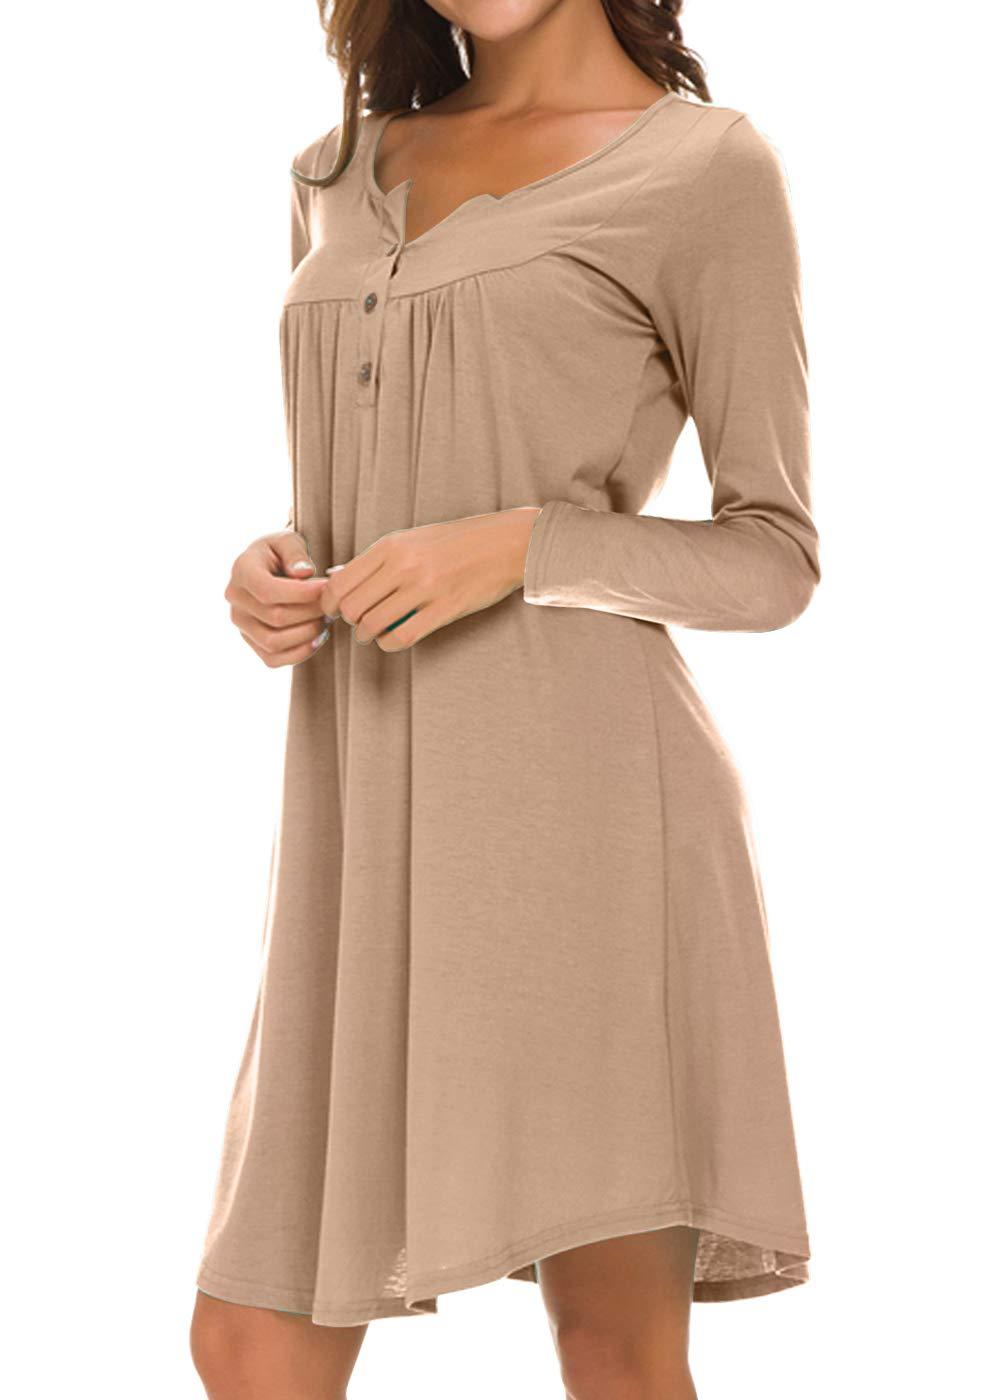 Eanklosco Long Sleeve Swing Dress Women Casual Loose Henley Shirt Dress (Light Coffee, S)